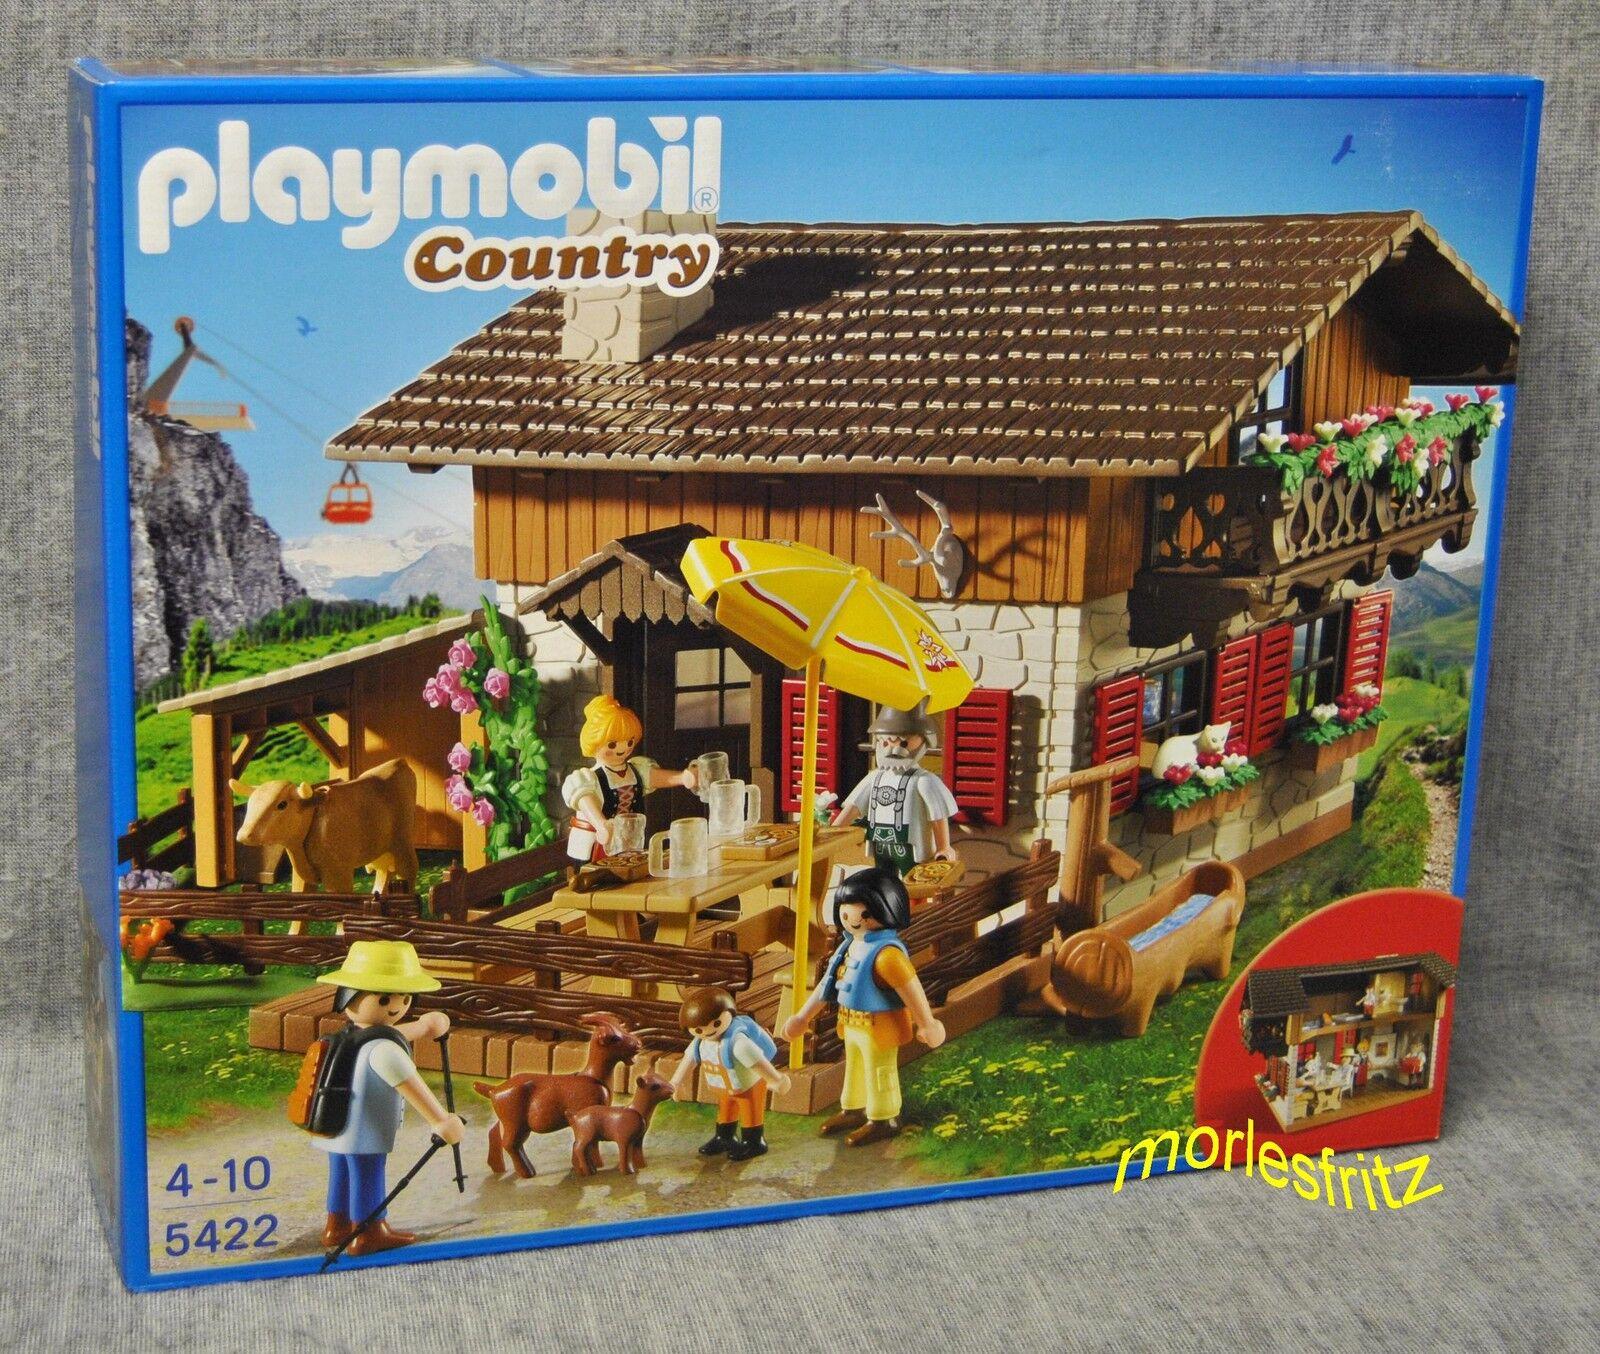 Playmobil 5422 ALMHÜTTE mit Kaminecke - Country - Große Bergwelt - Neu